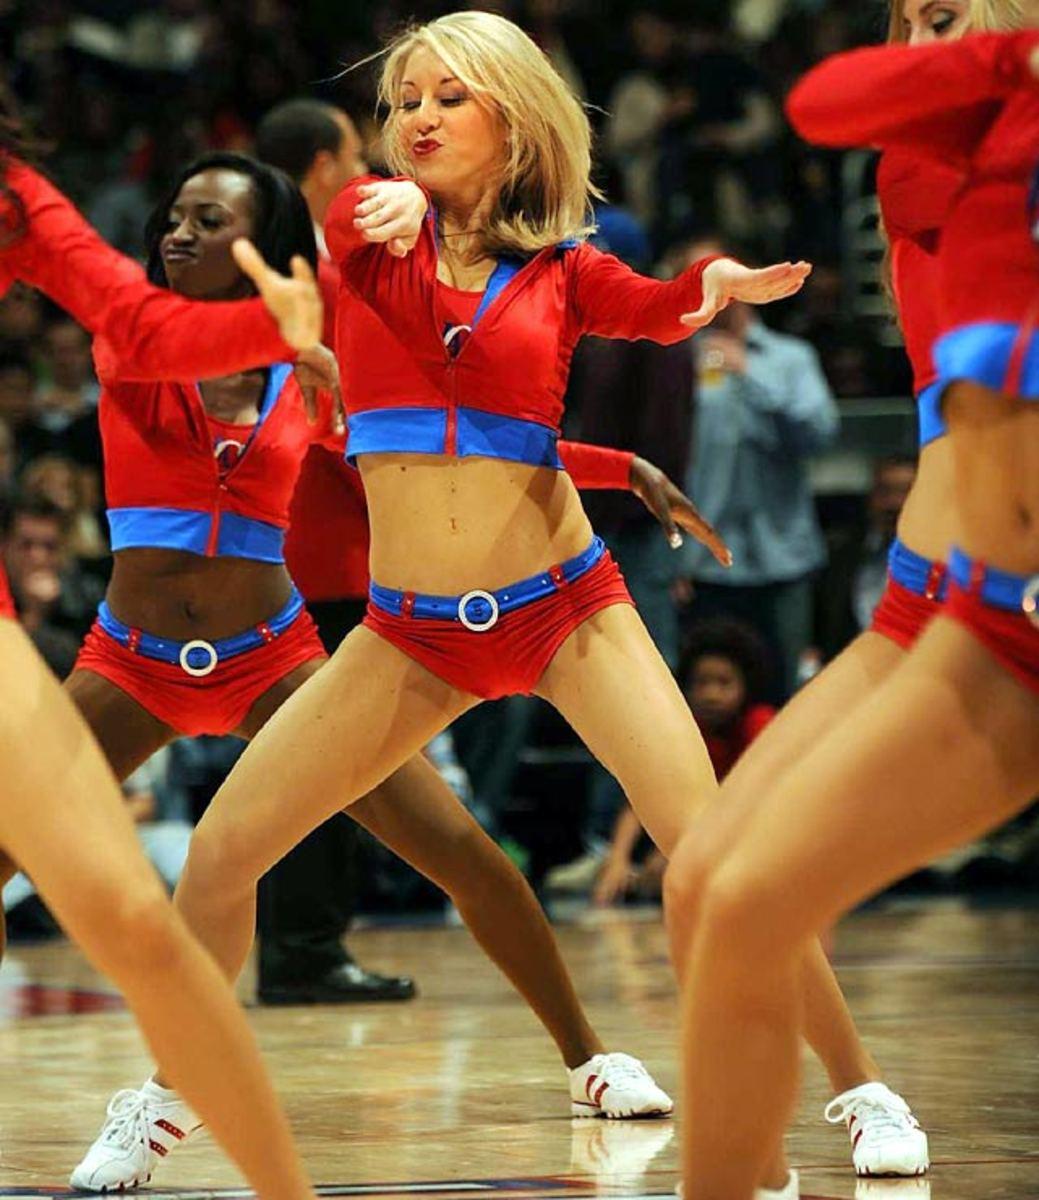 clippers-spirit-dance-team%2818%29.jpg